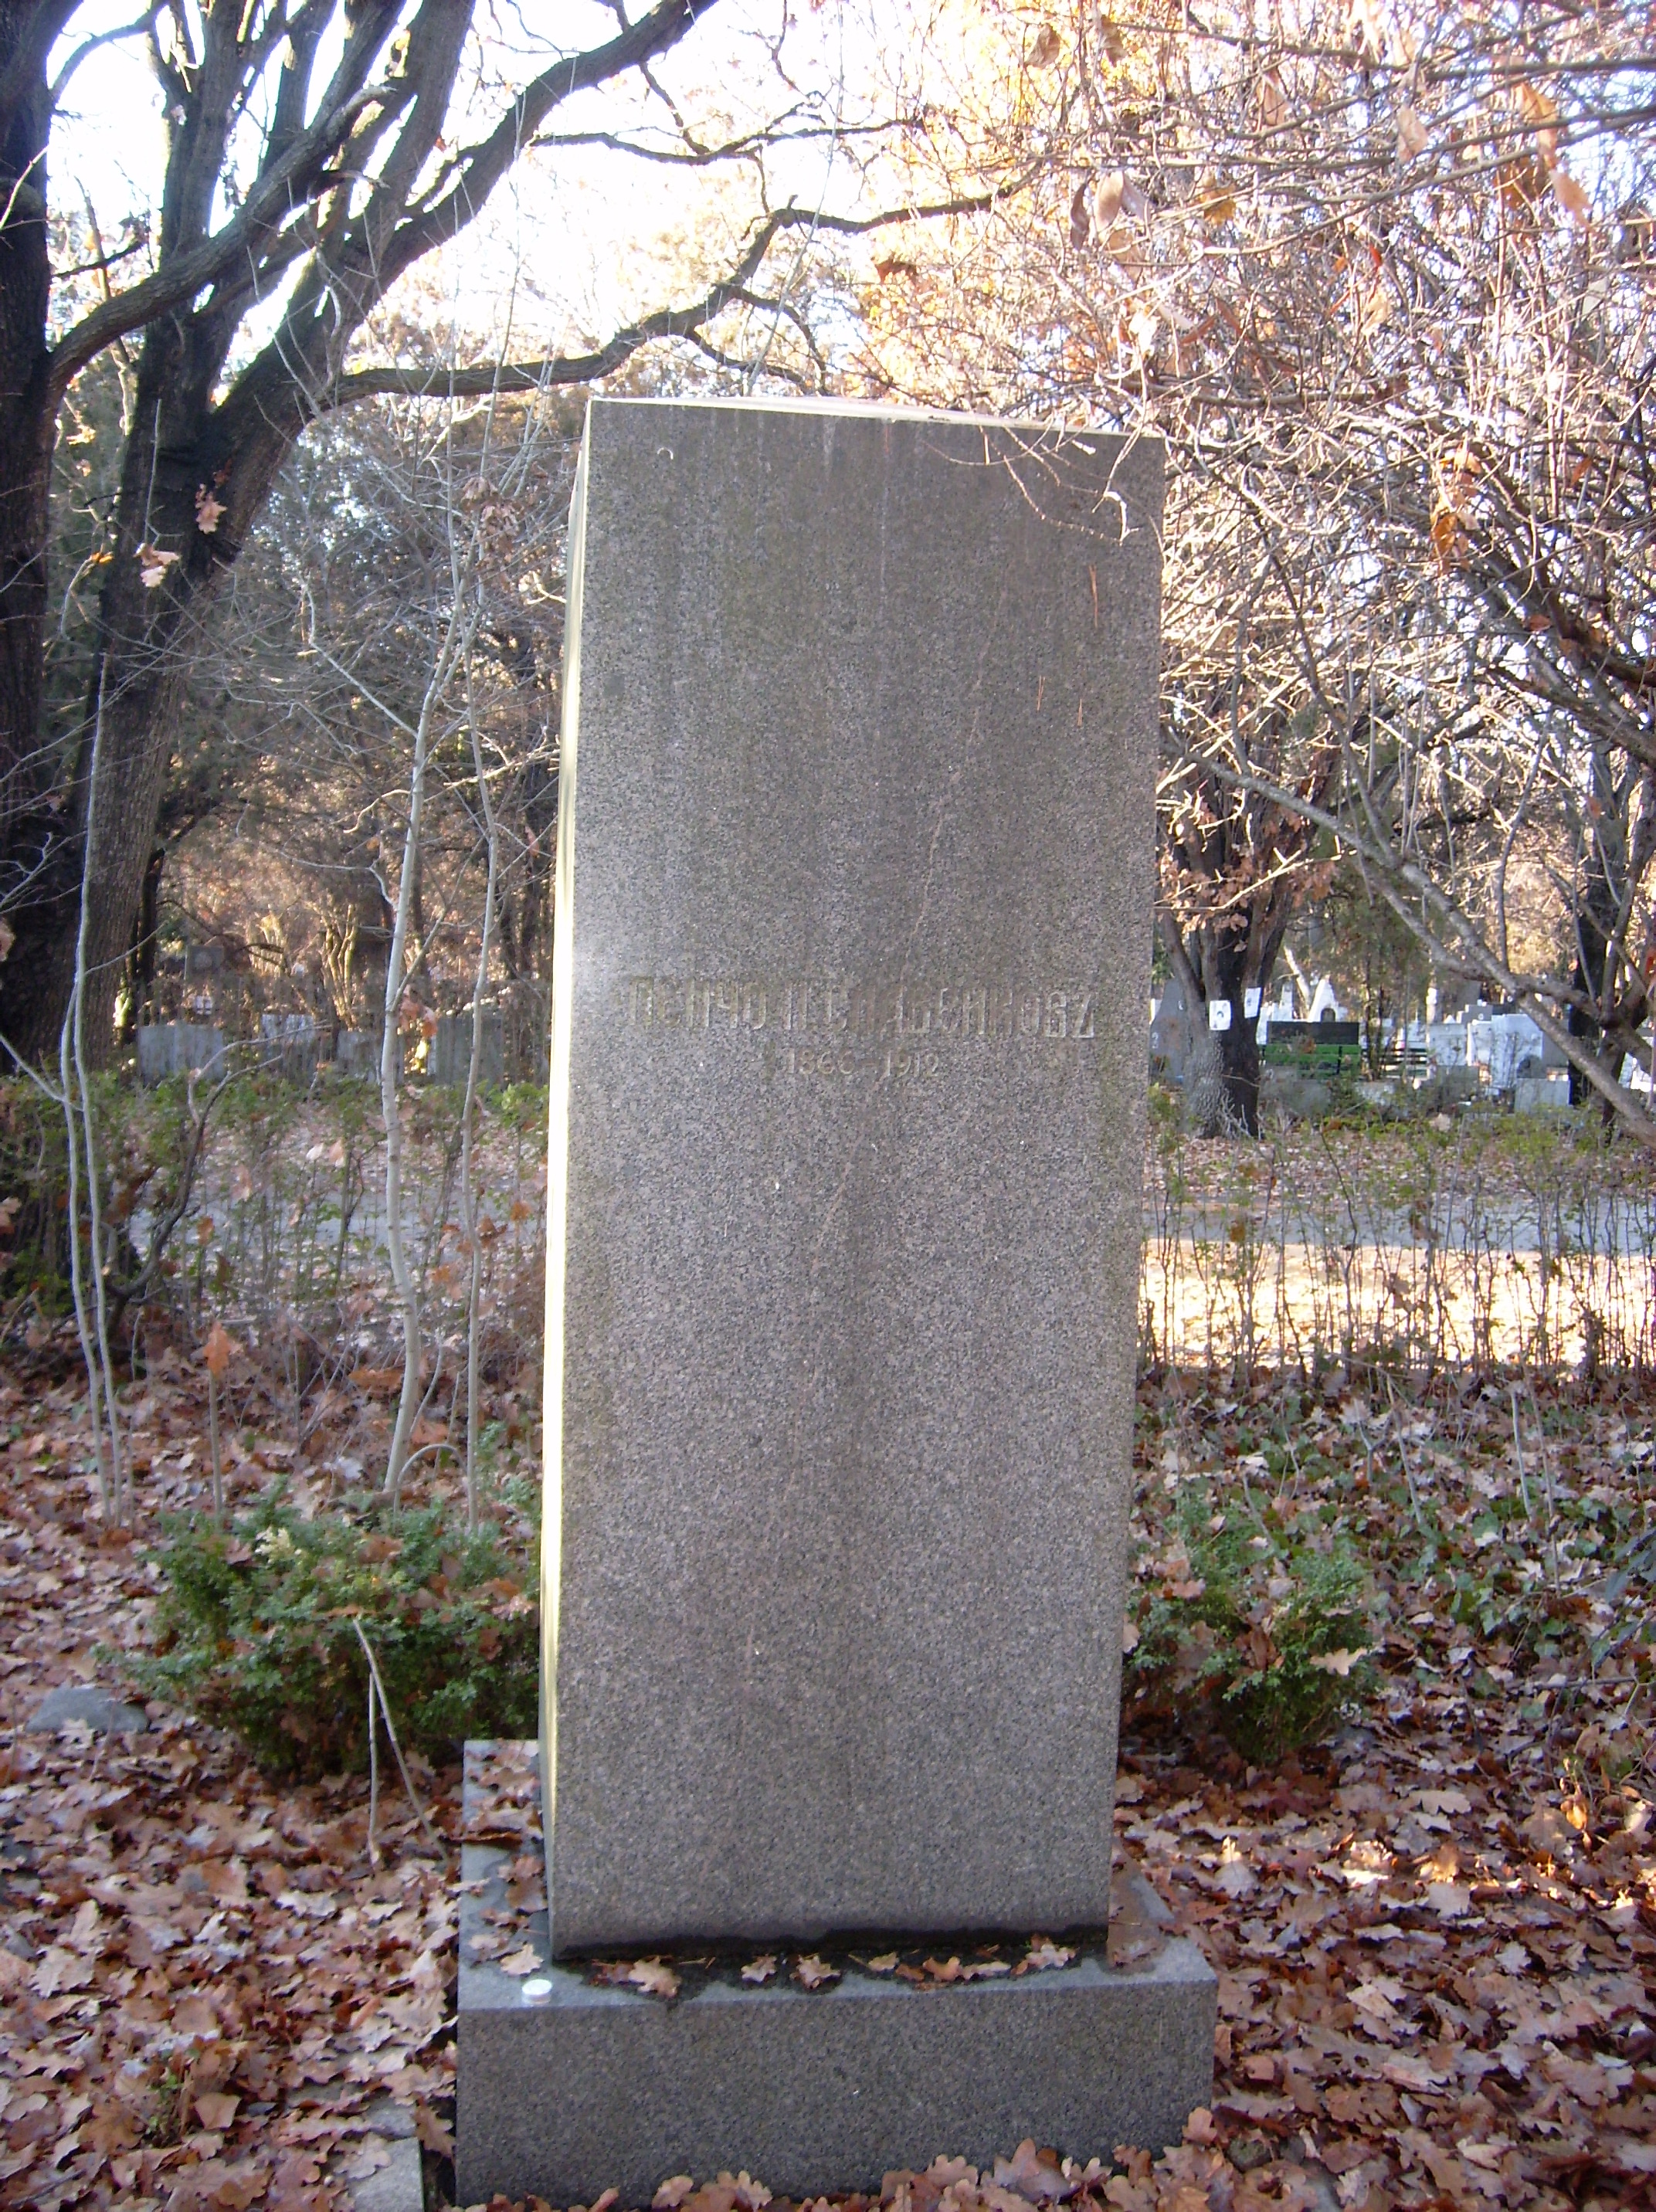 https://upload.wikimedia.org/wikipedia/commons/3/38/Pencho_Slaveykov%27s_Grave_in_Sofia.JPG